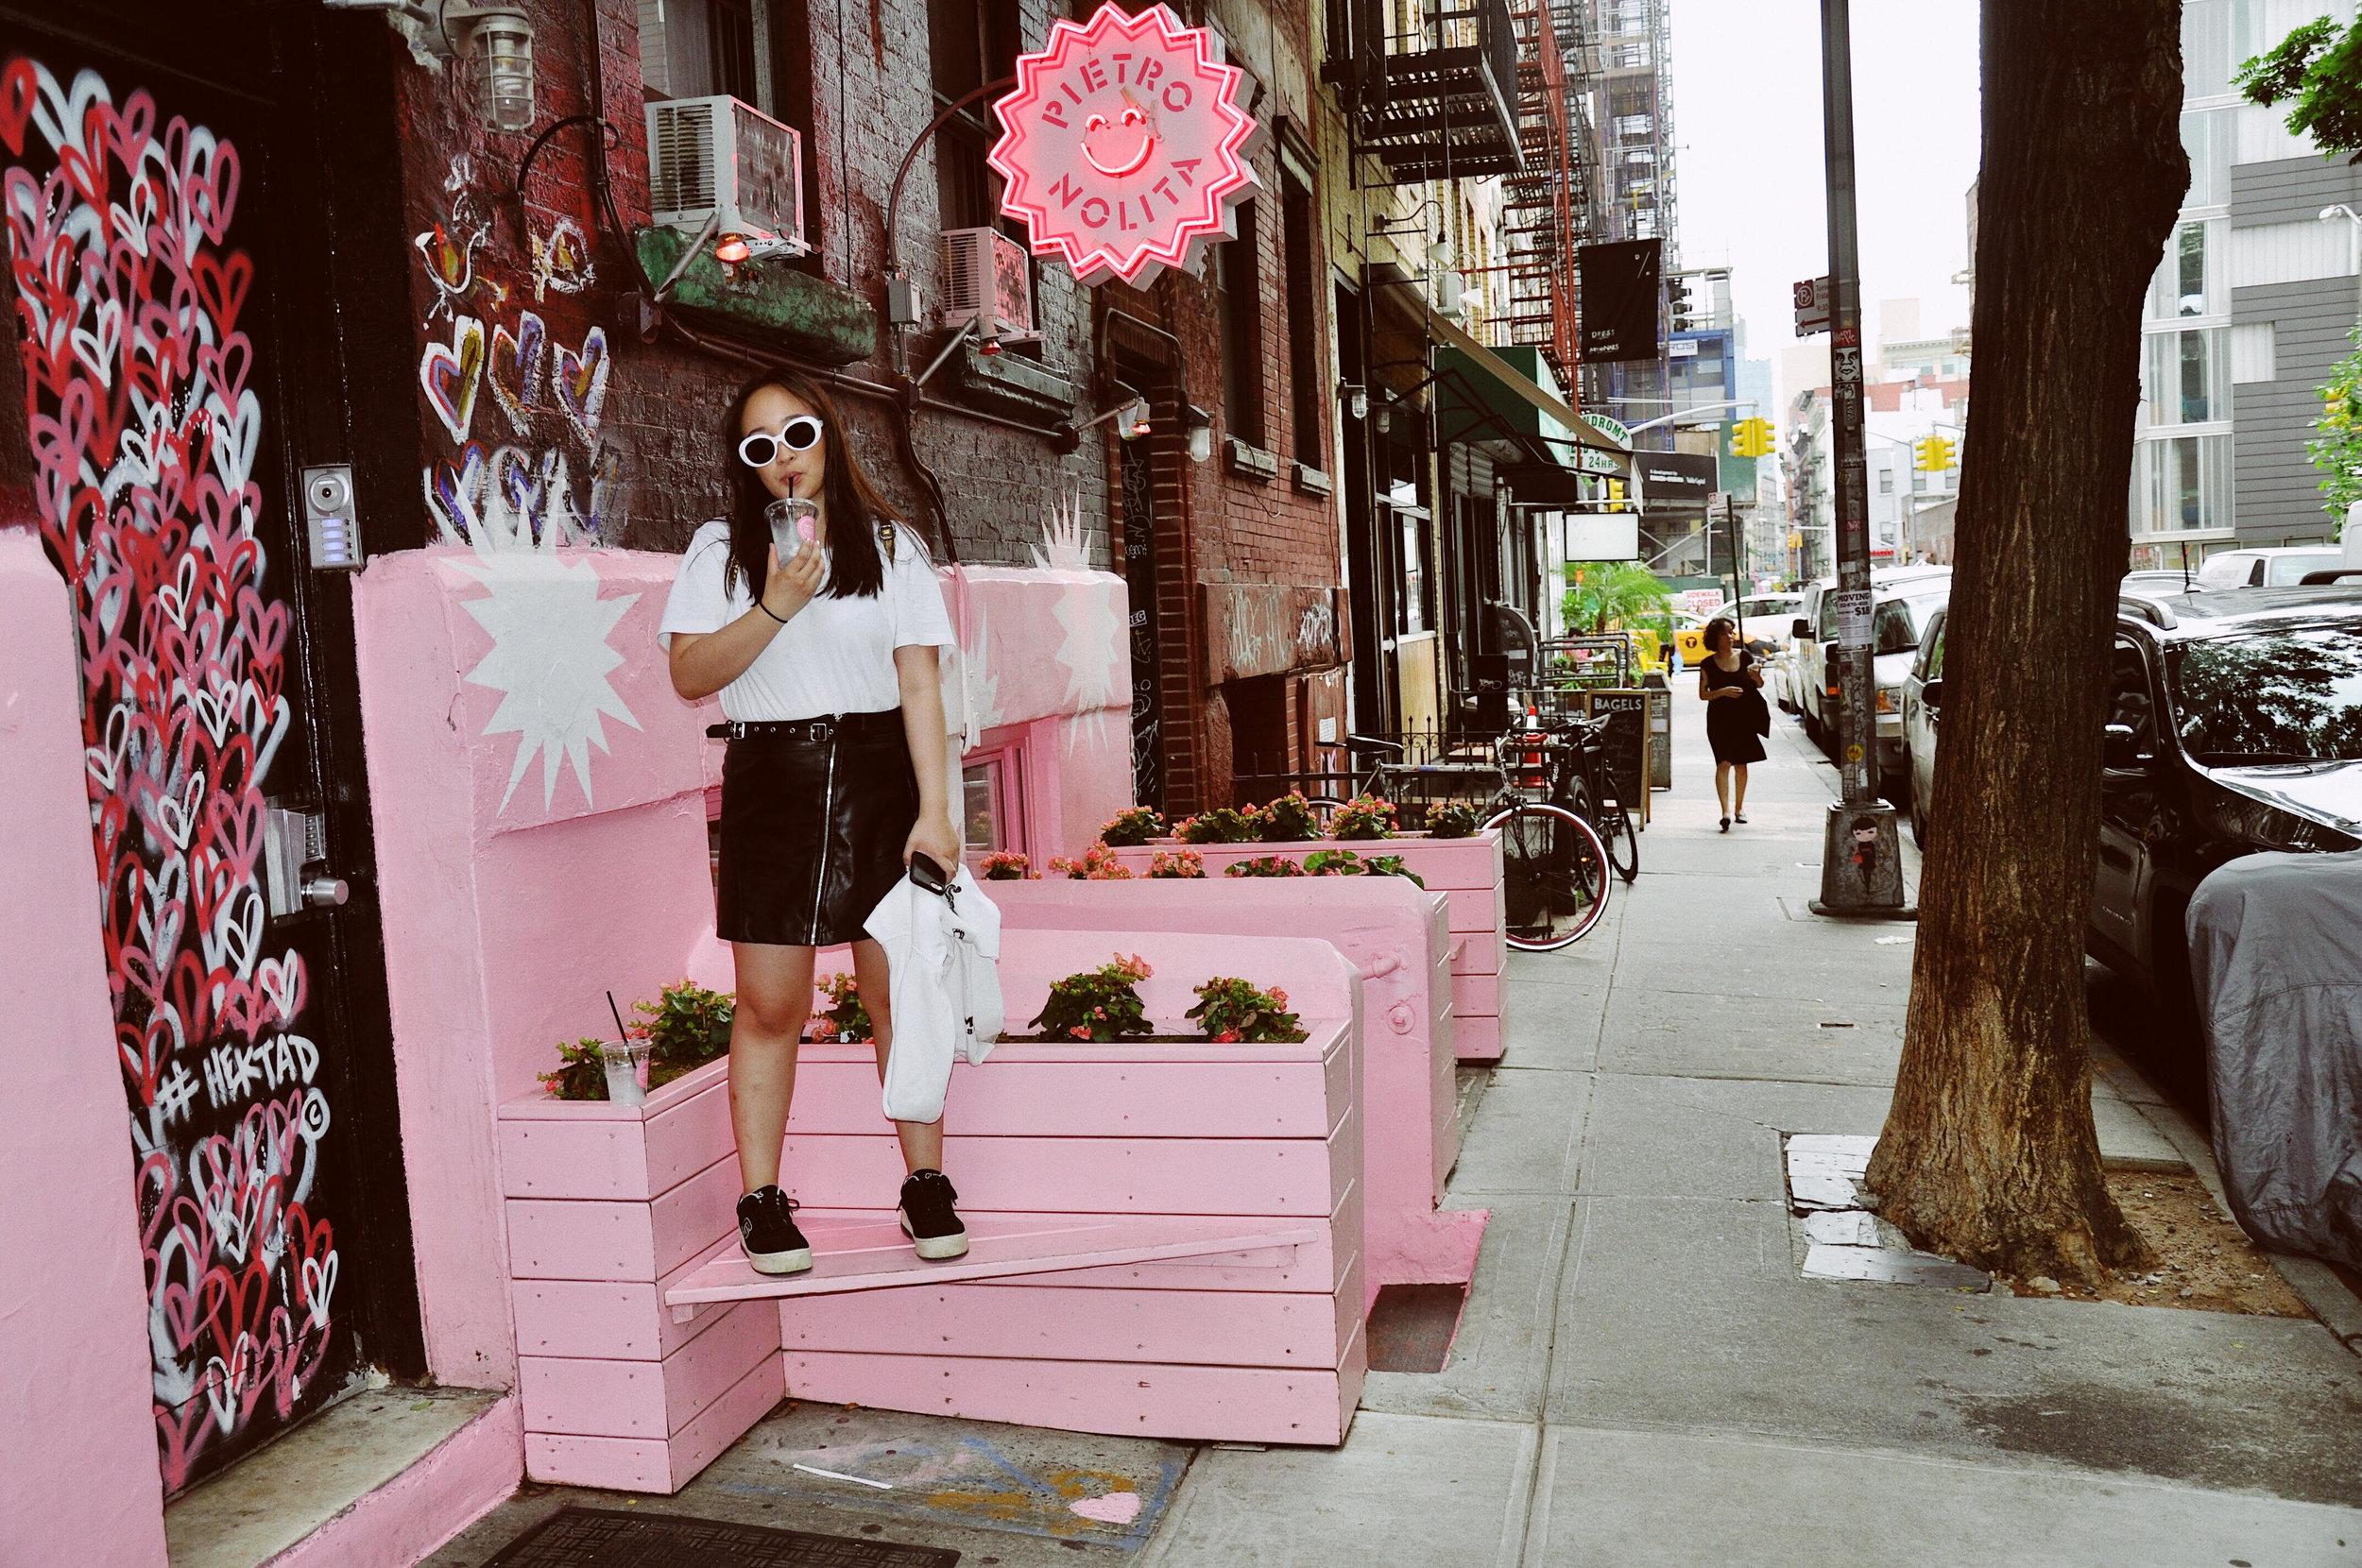 Pietro Nolita, Lower East Side